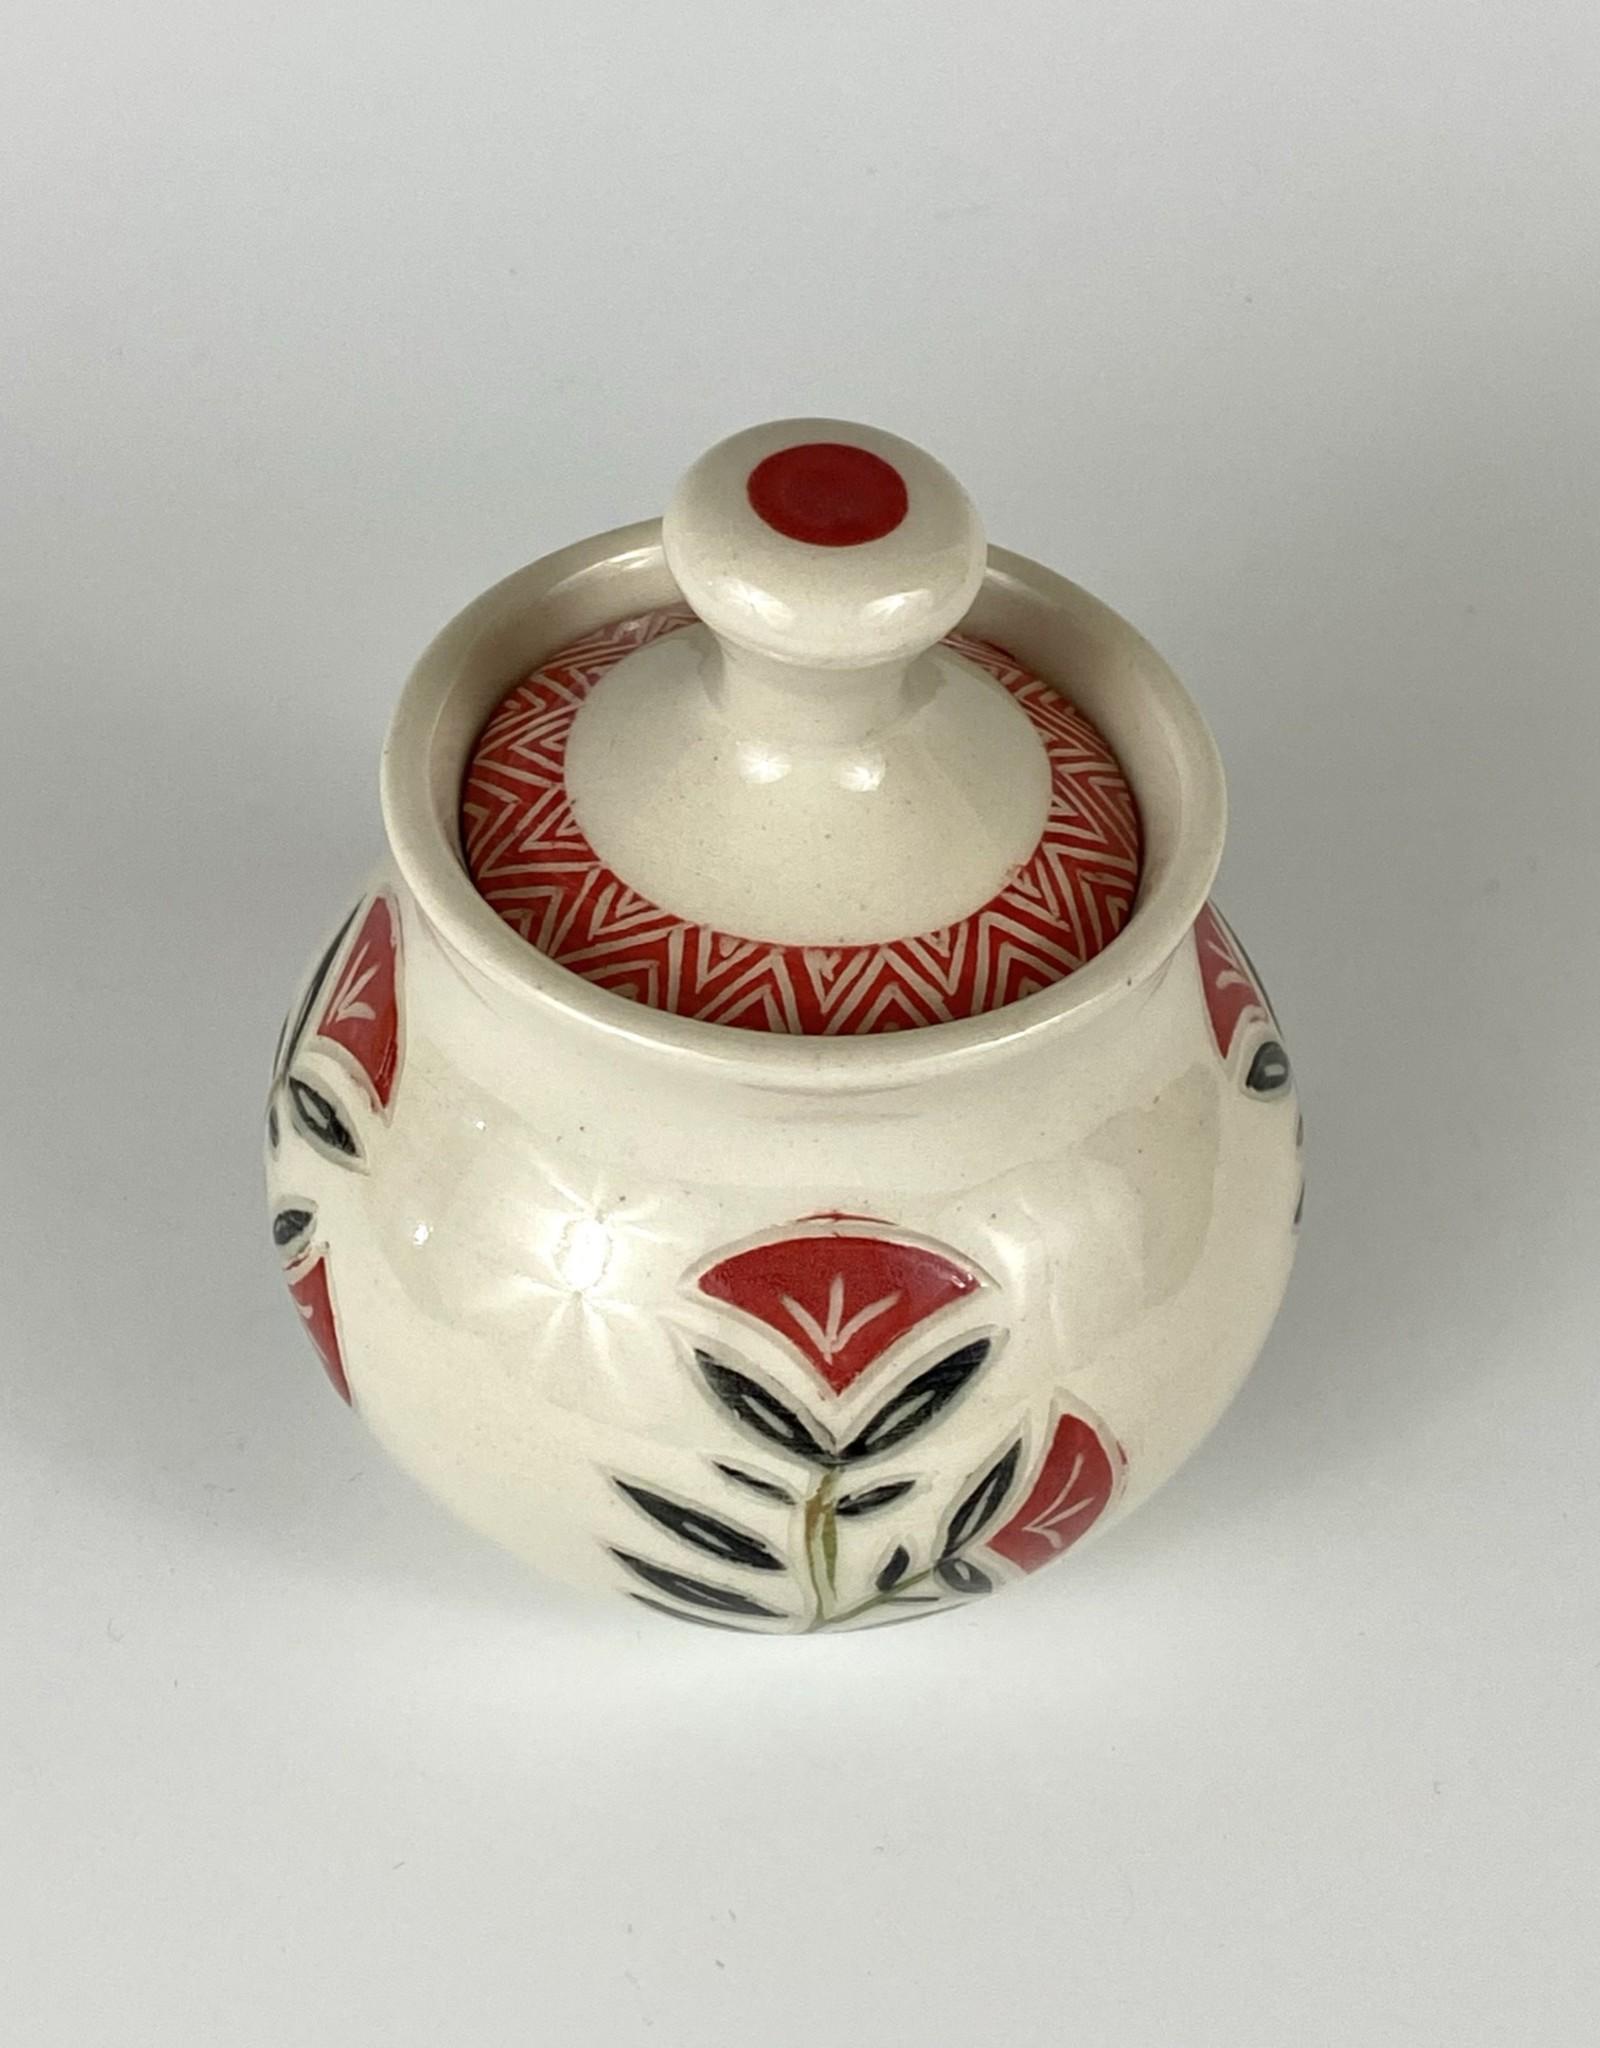 Anshula Tayal Amaati Lidded red flower Jar